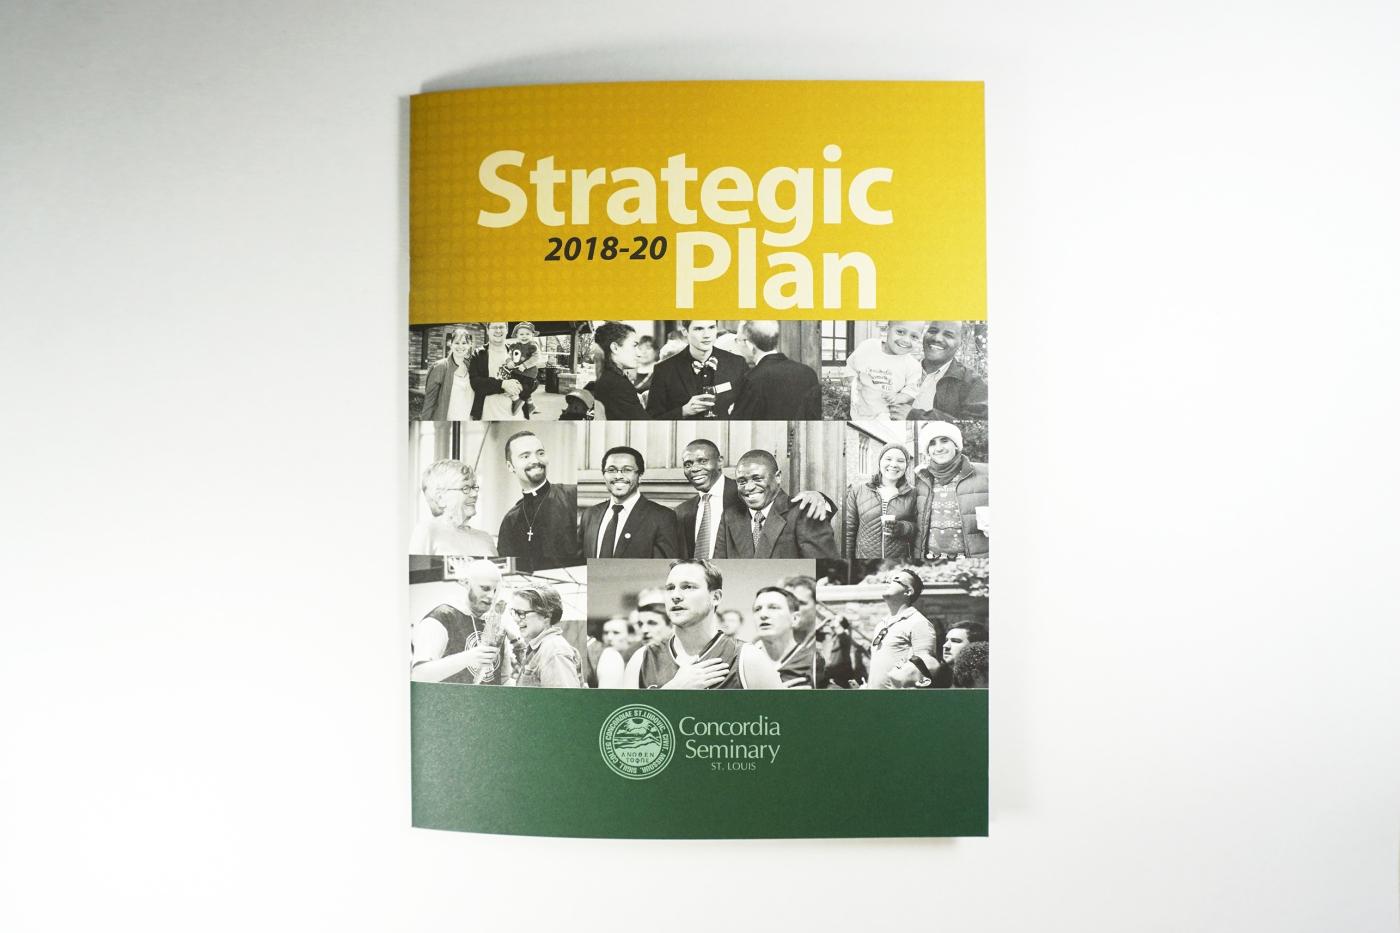 strategicplan04_online